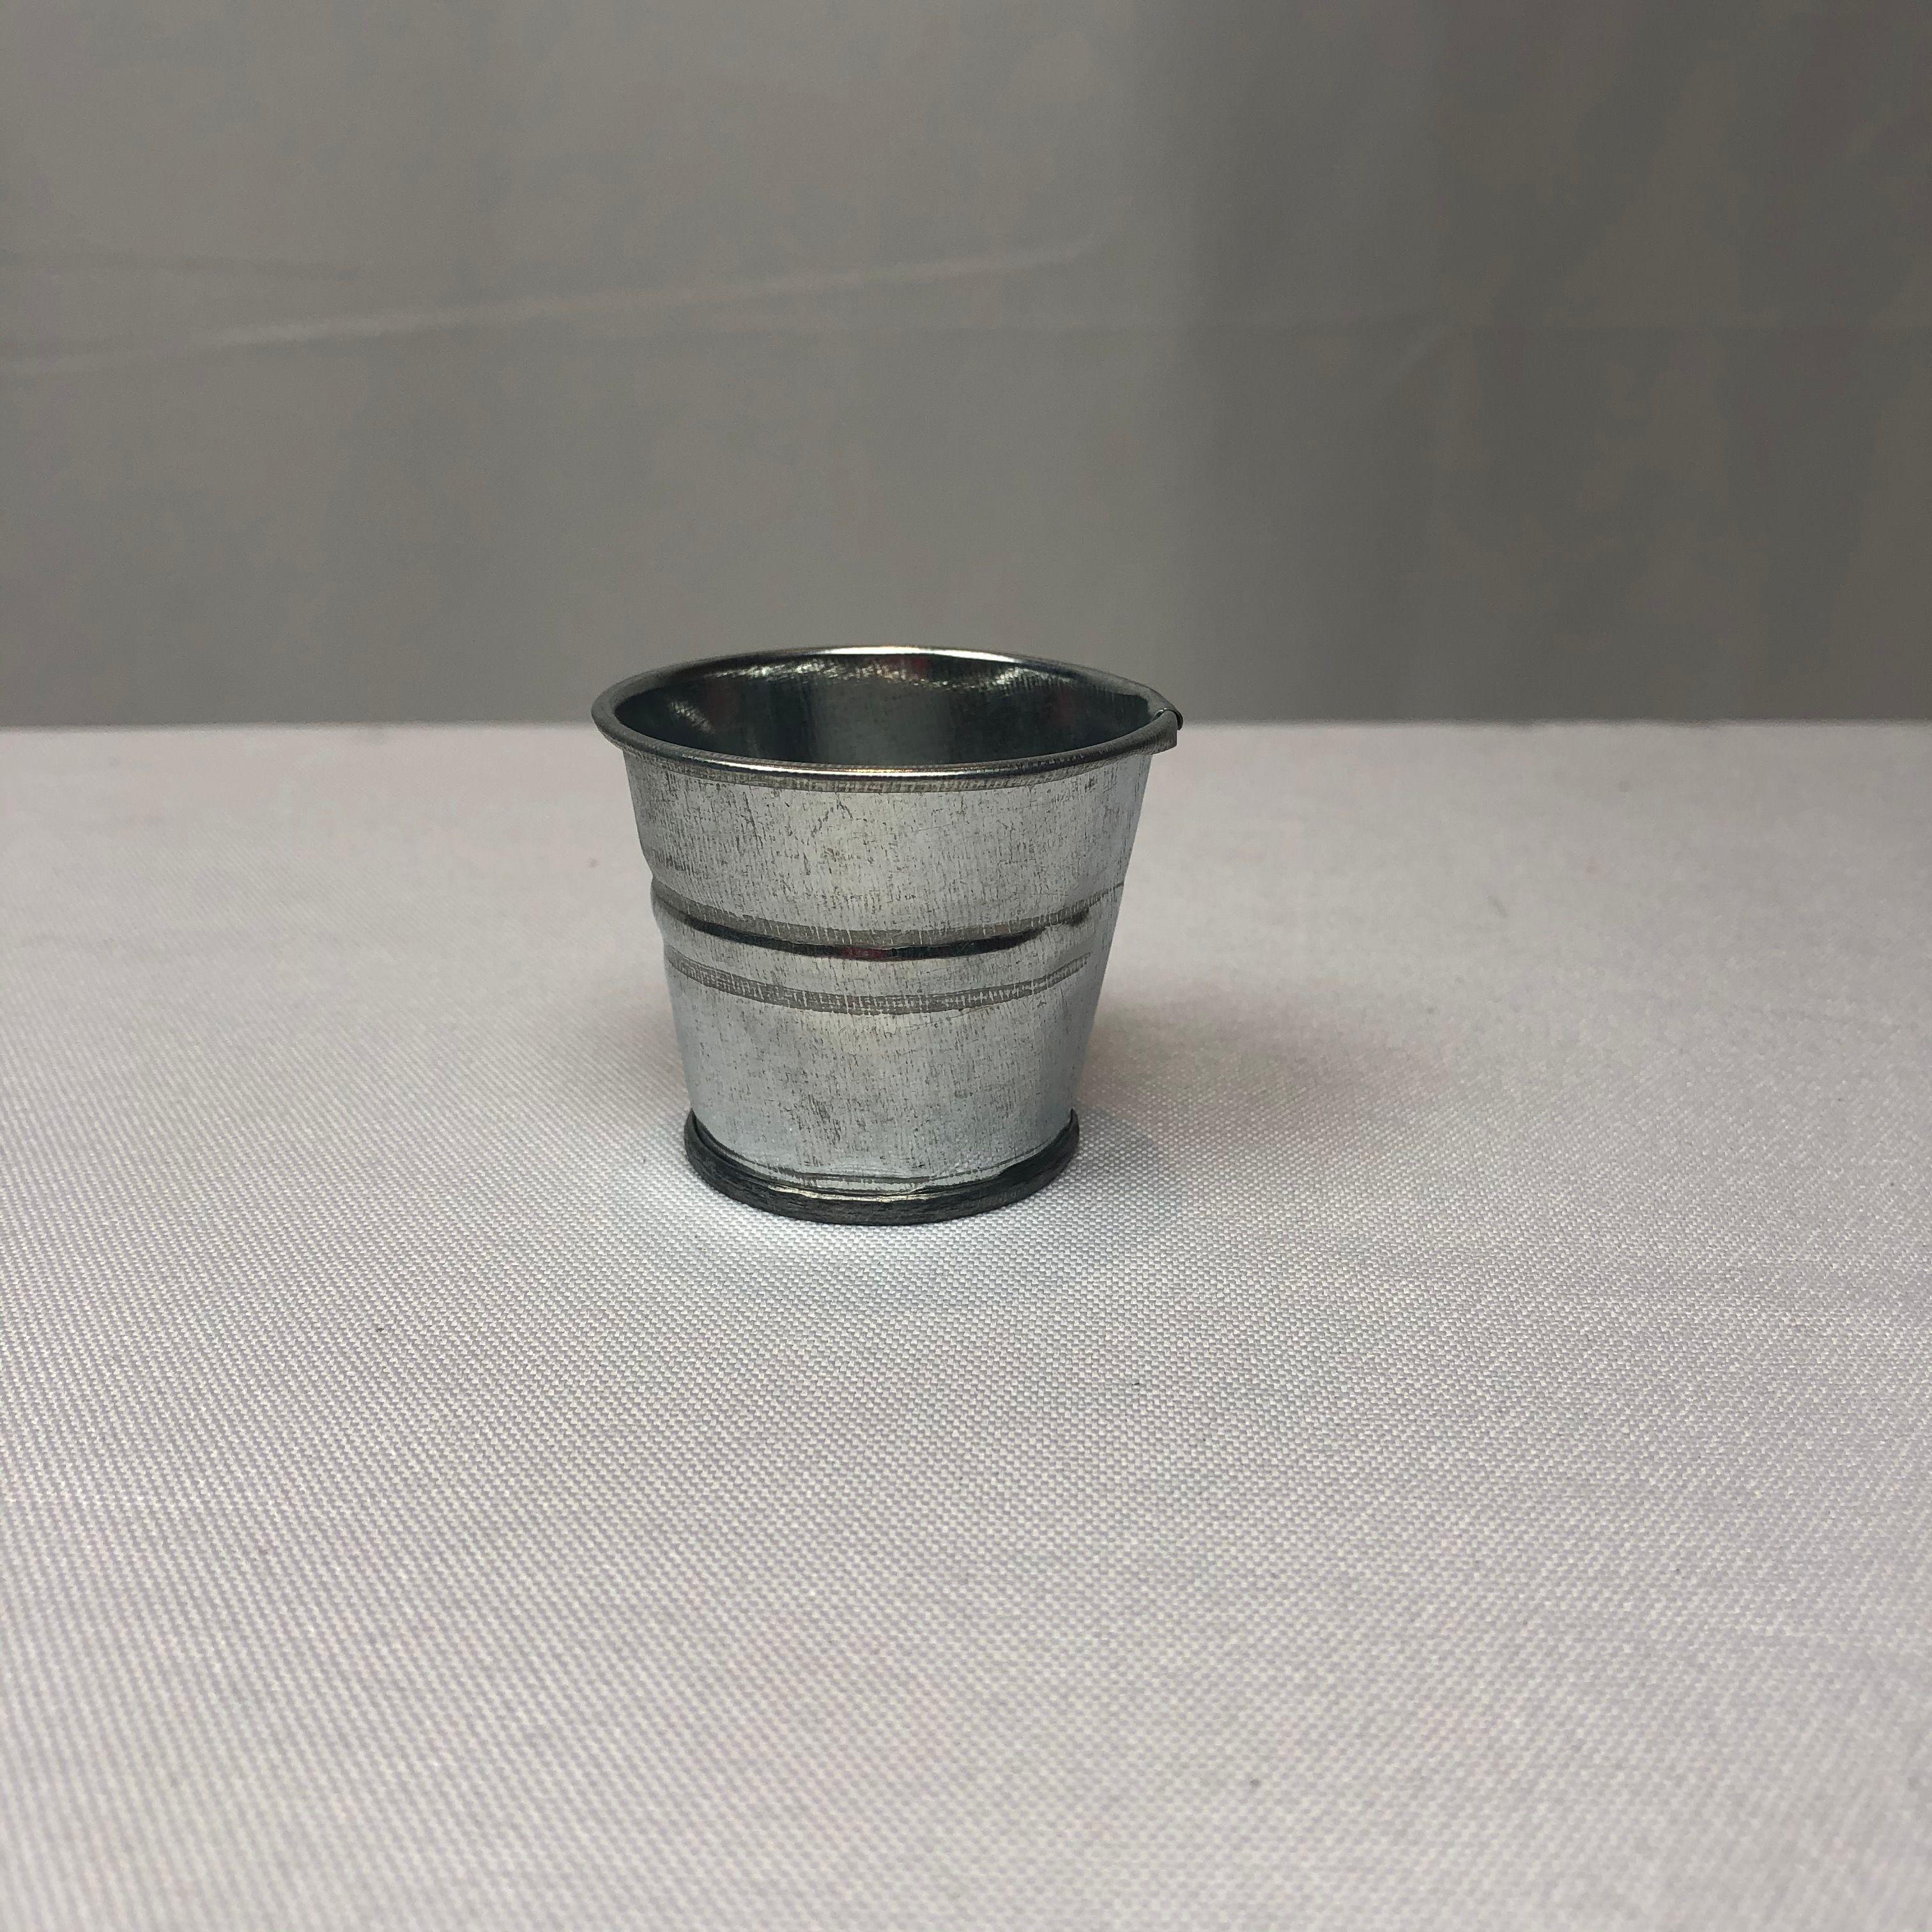 2020 Cute D5xh4cm Rustic Nostalgia Mini Nursery Pots Silver Wedding Succulent Planter Mini Galvanized Tub For Small Plant Sf 059 From Gudanyijinbuzai 0 36 Dhgate Com